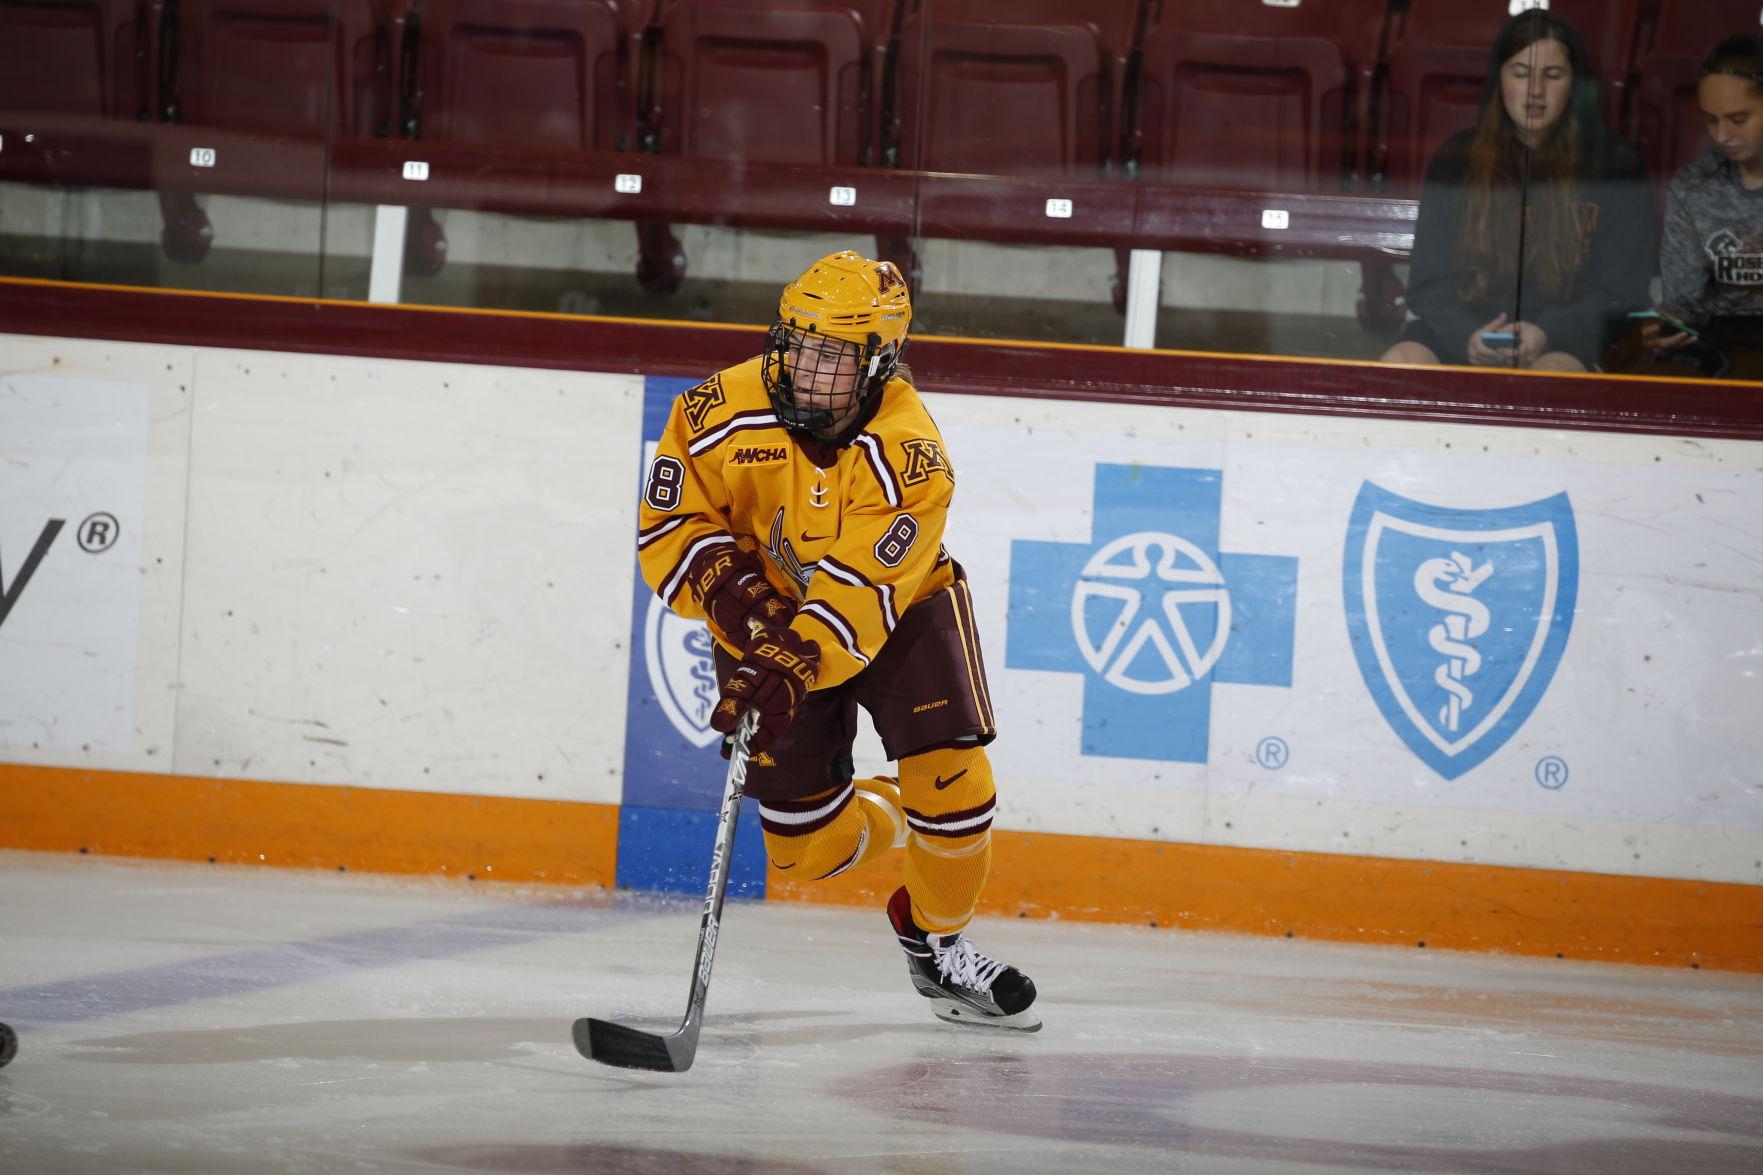 WCHA: Women - From Skipper To Gopher, Kippin Keller Reflects On Hockey Career Thus Far